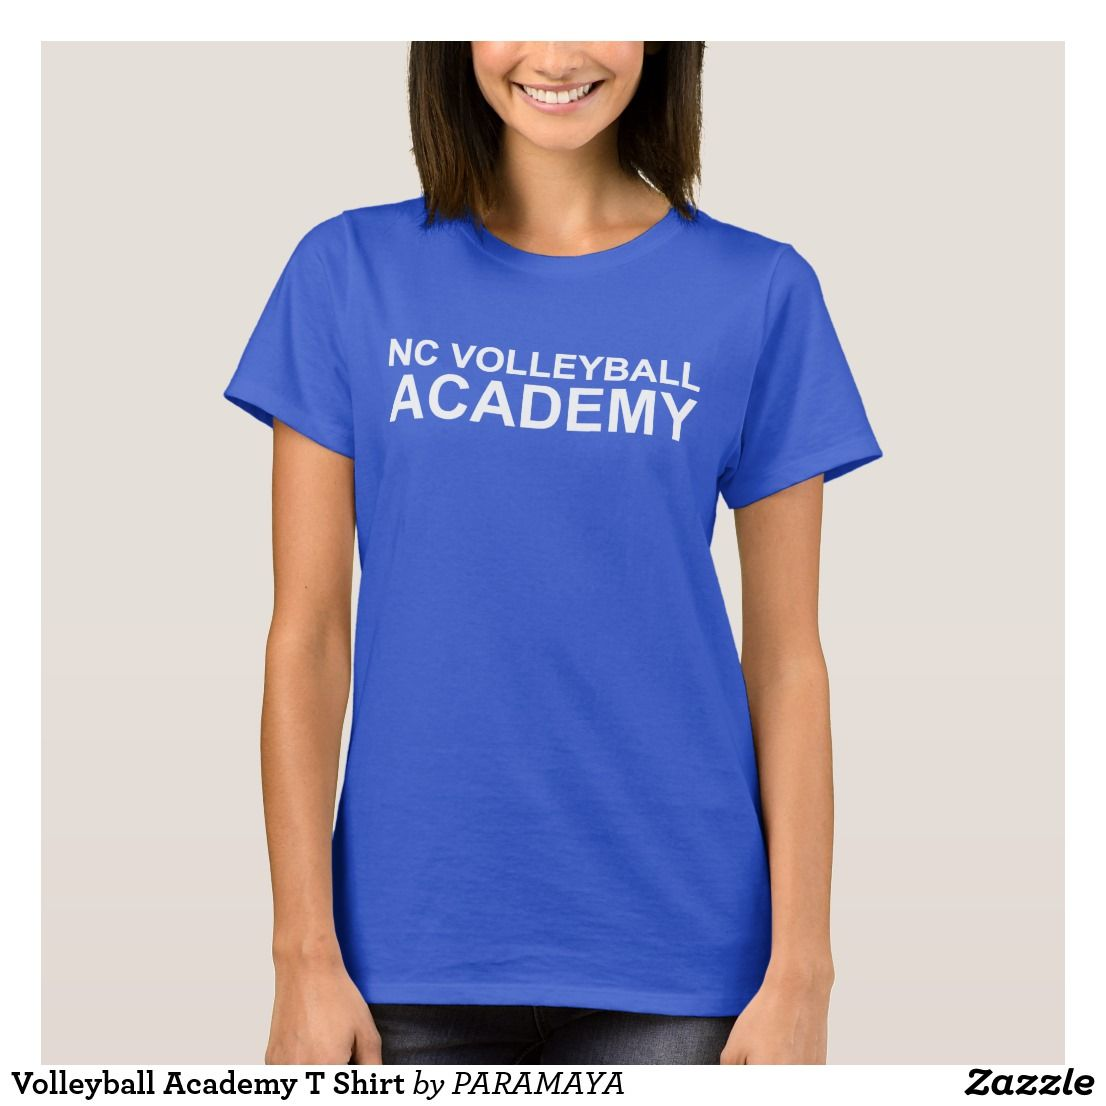 Volleyball Academy T Shirt Shirt Designs T Shirts For Women Shirt Style